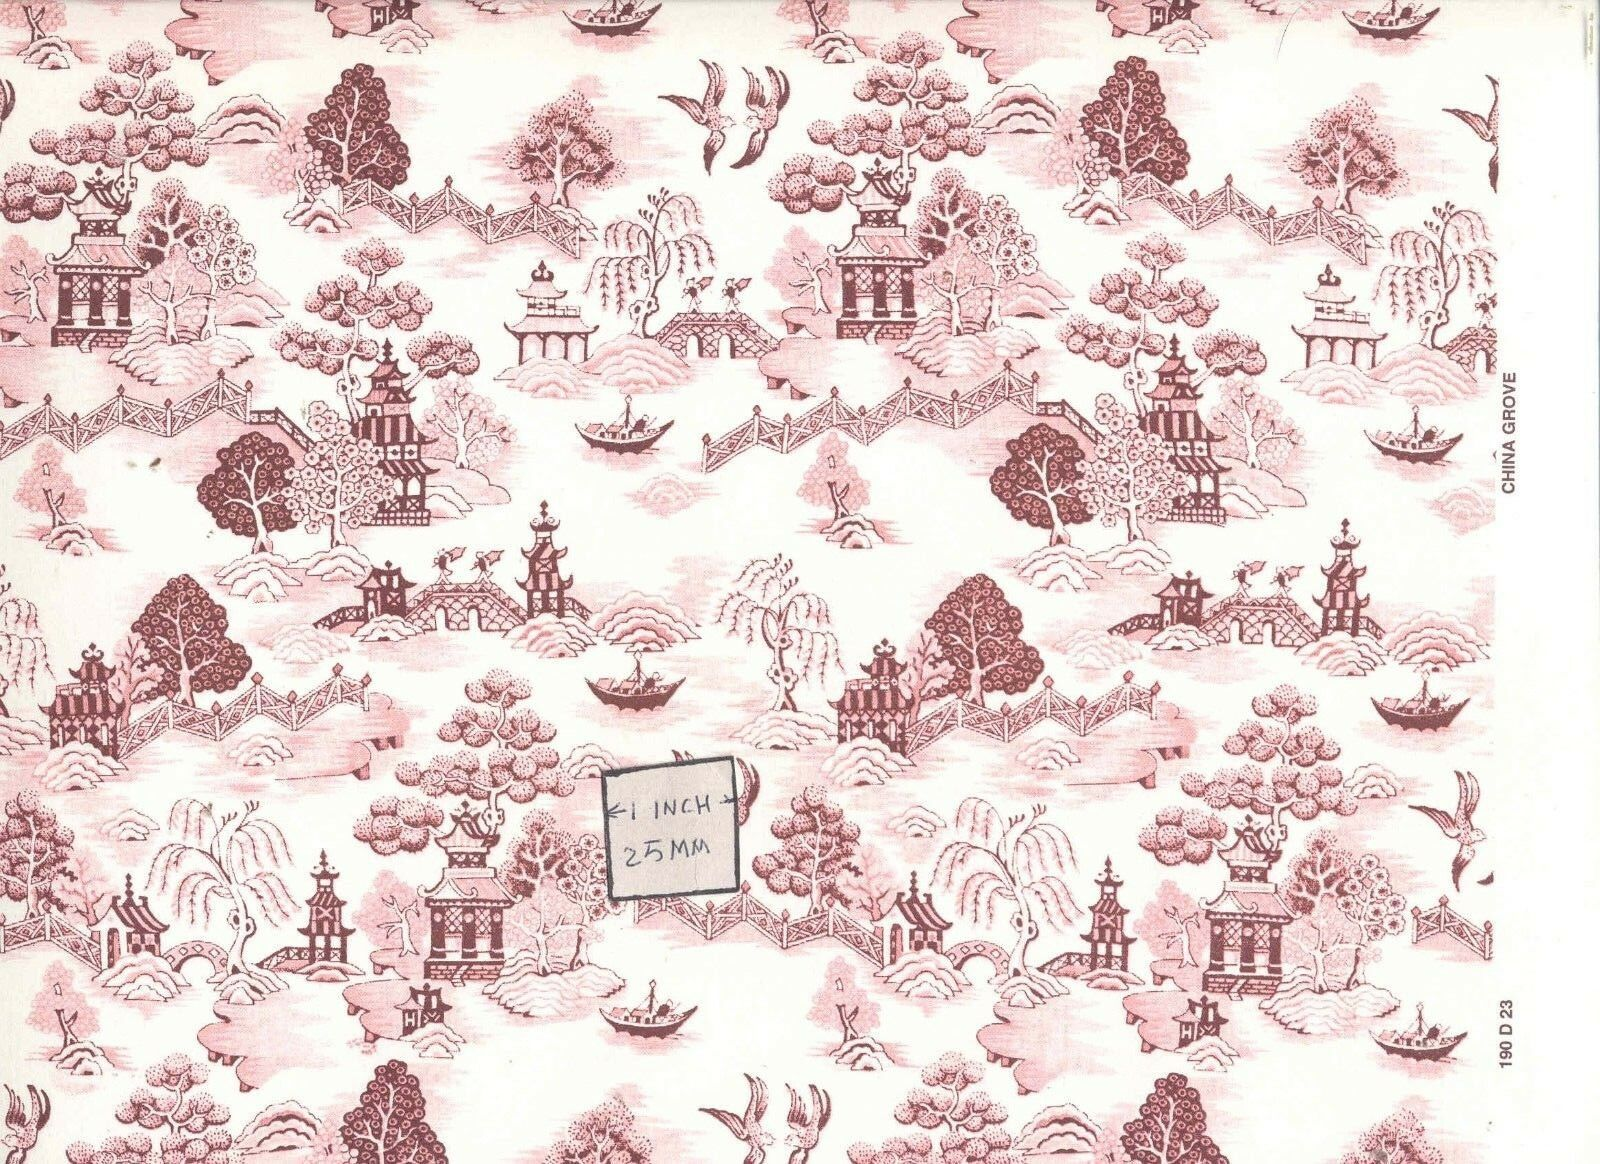 Natasha 193D23 MiniGraphics dollhouse wallpaper 1pc 1//12 scale